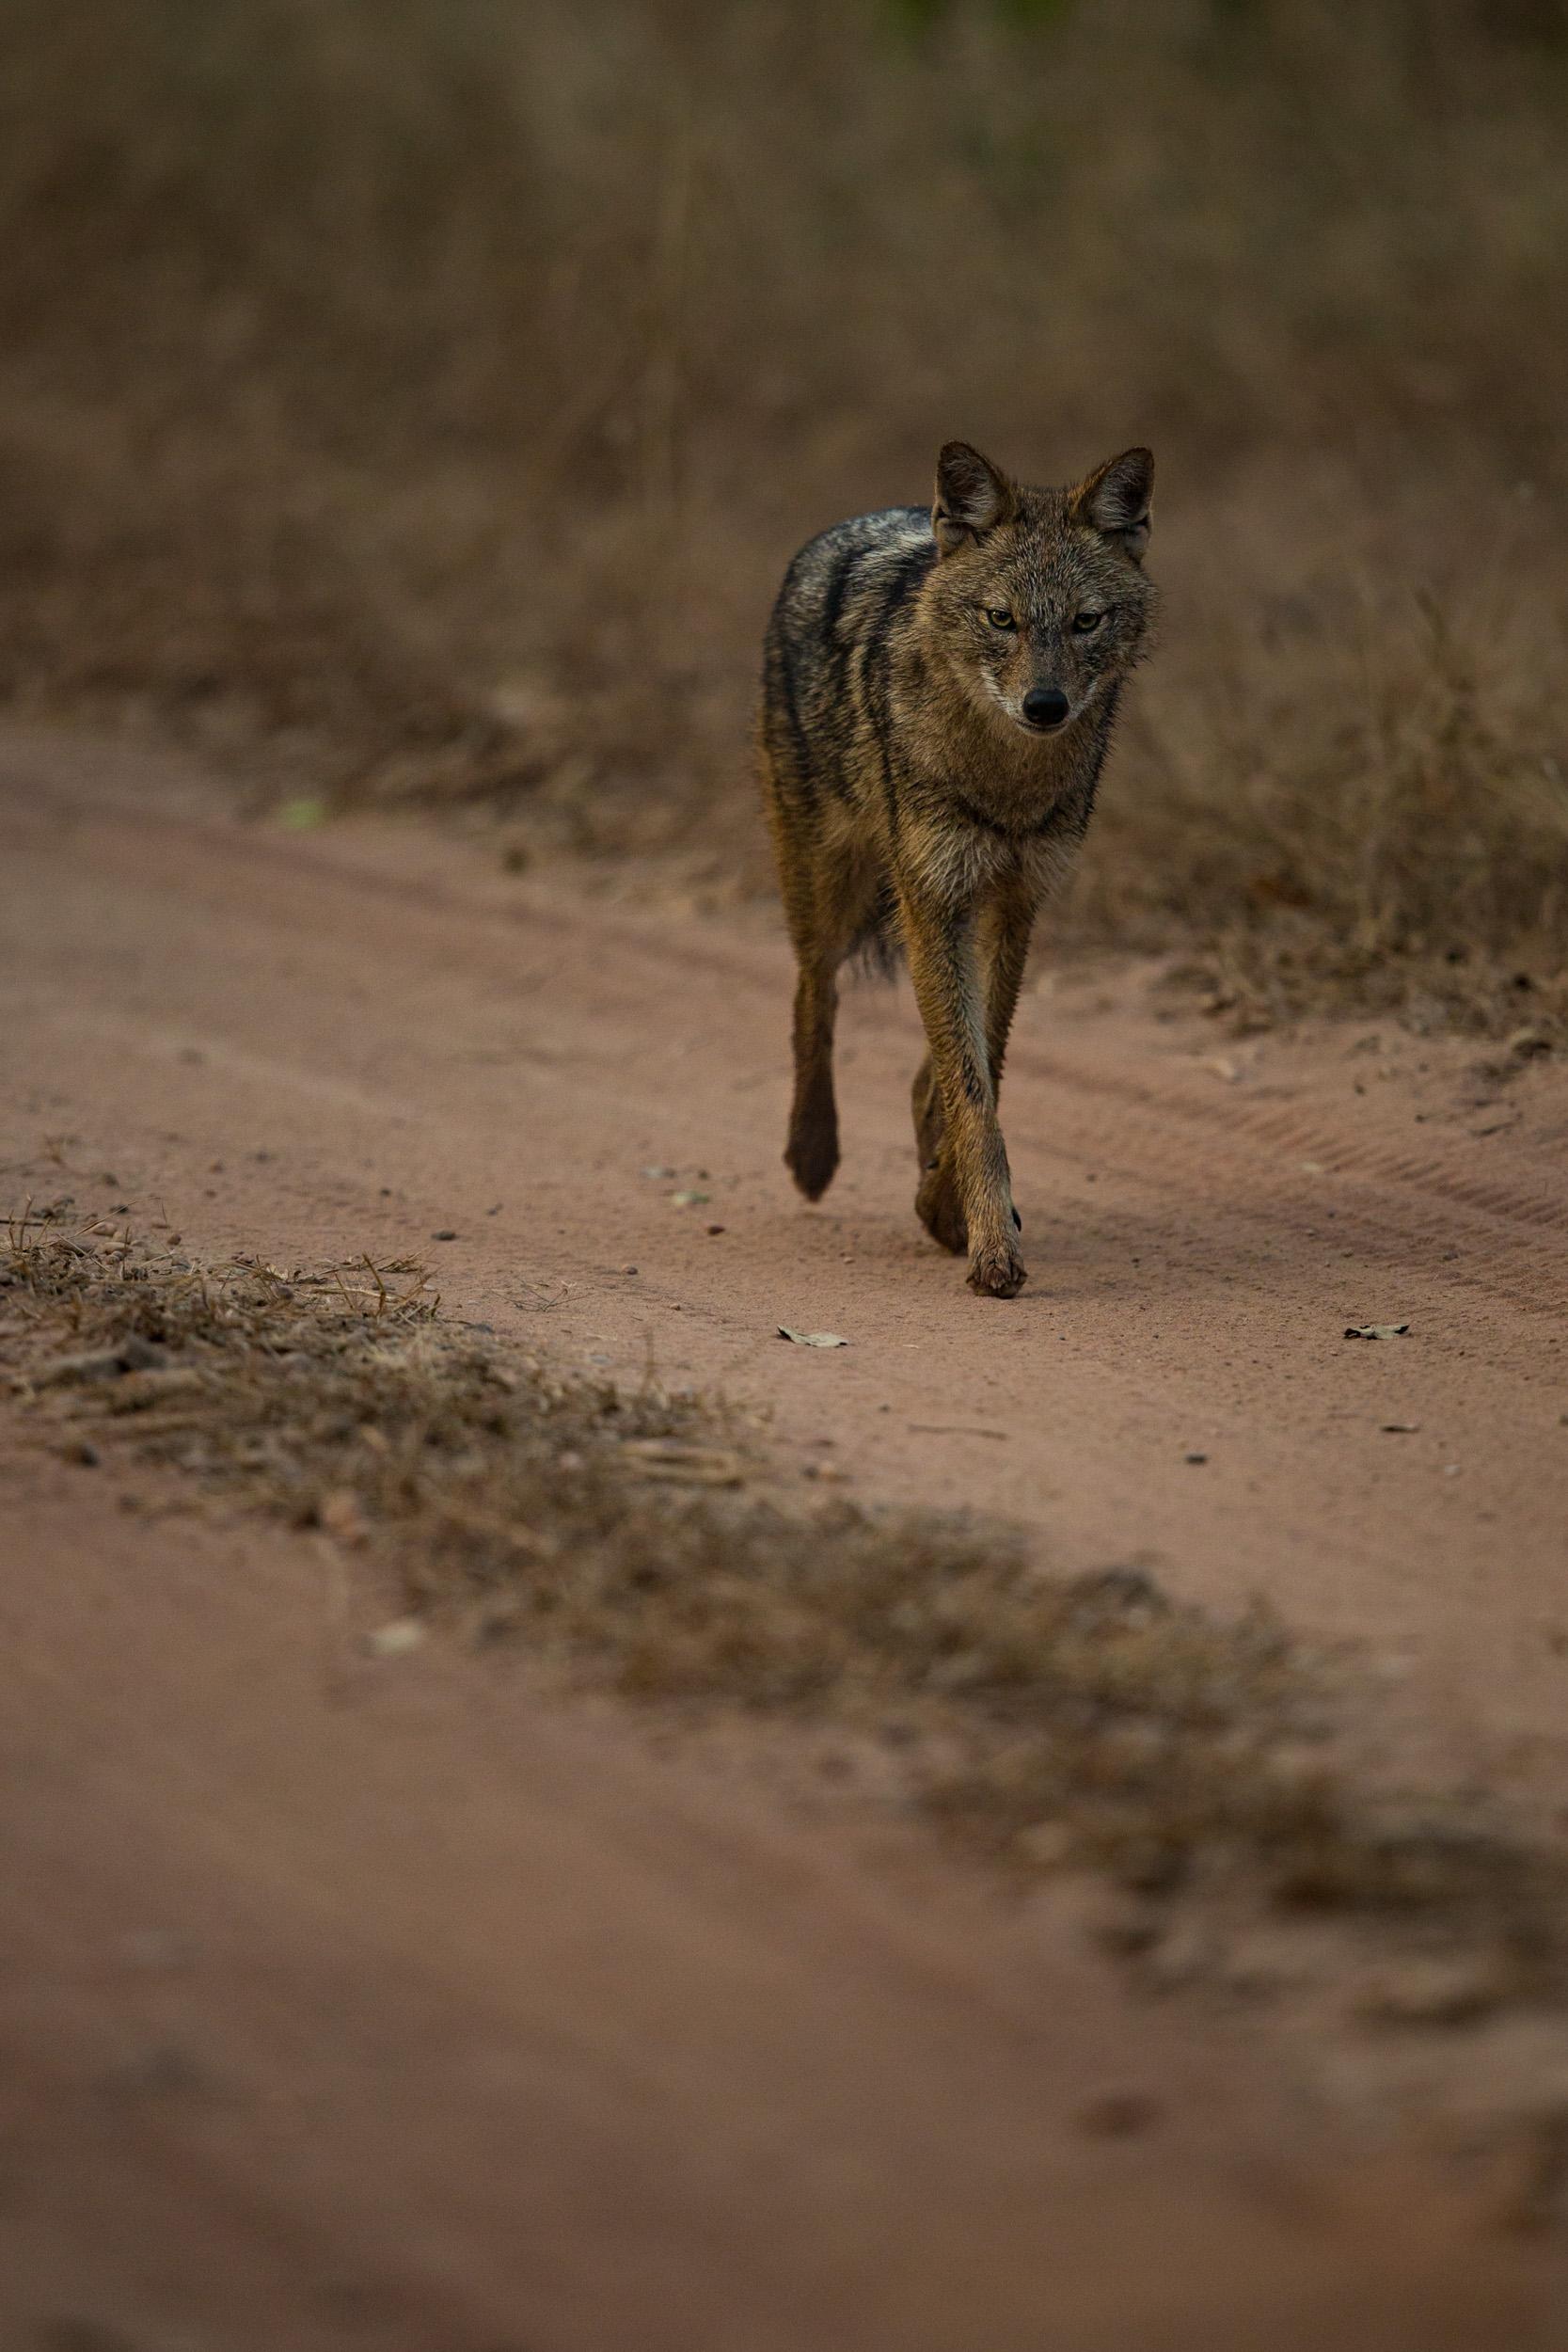 Golden jackal (Canis aureus).   CLICK IMAGE for full screen.